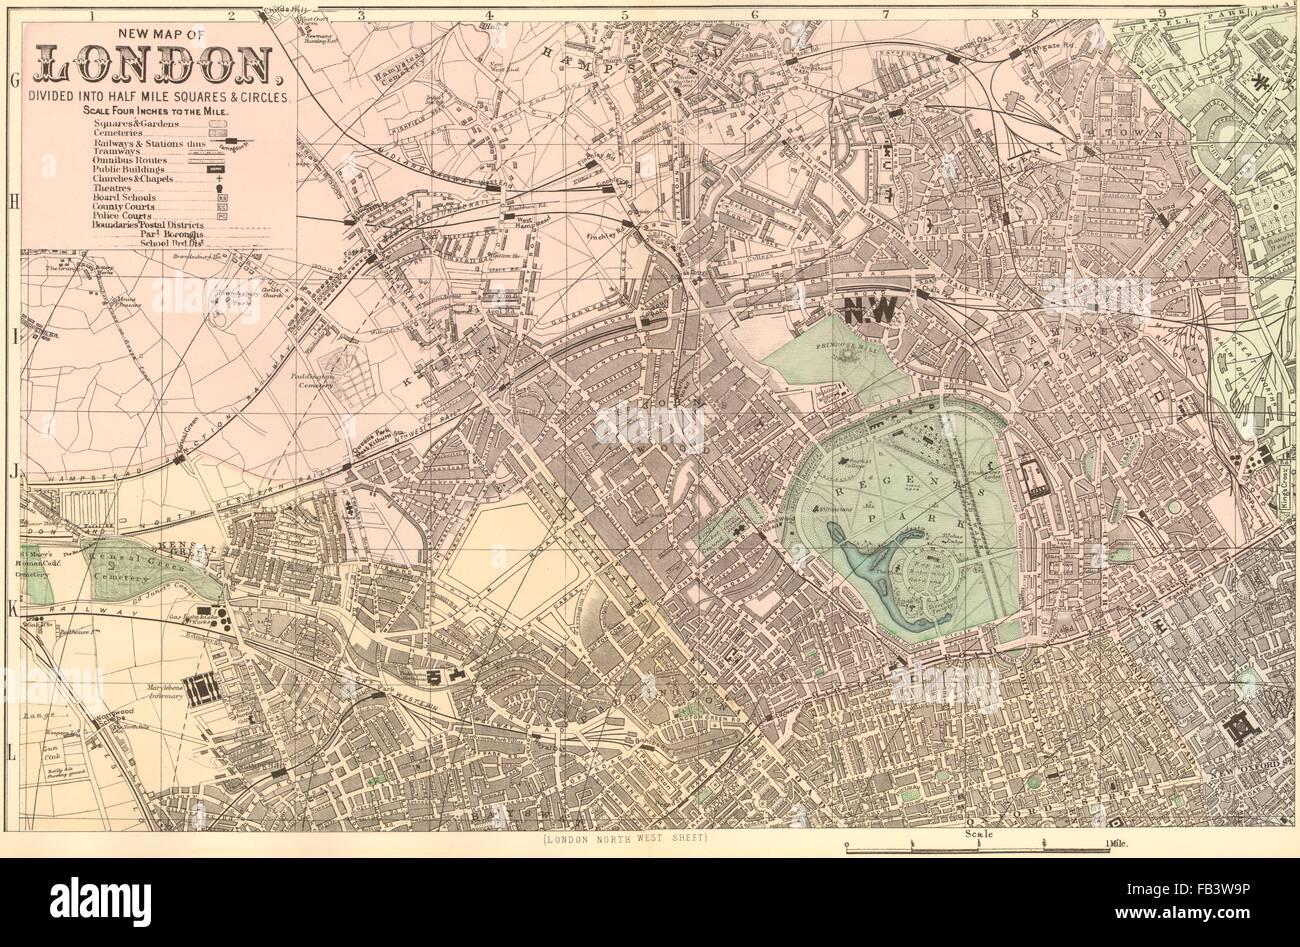 London North West St John S Wood Marylebone Camden Town Plan Stock